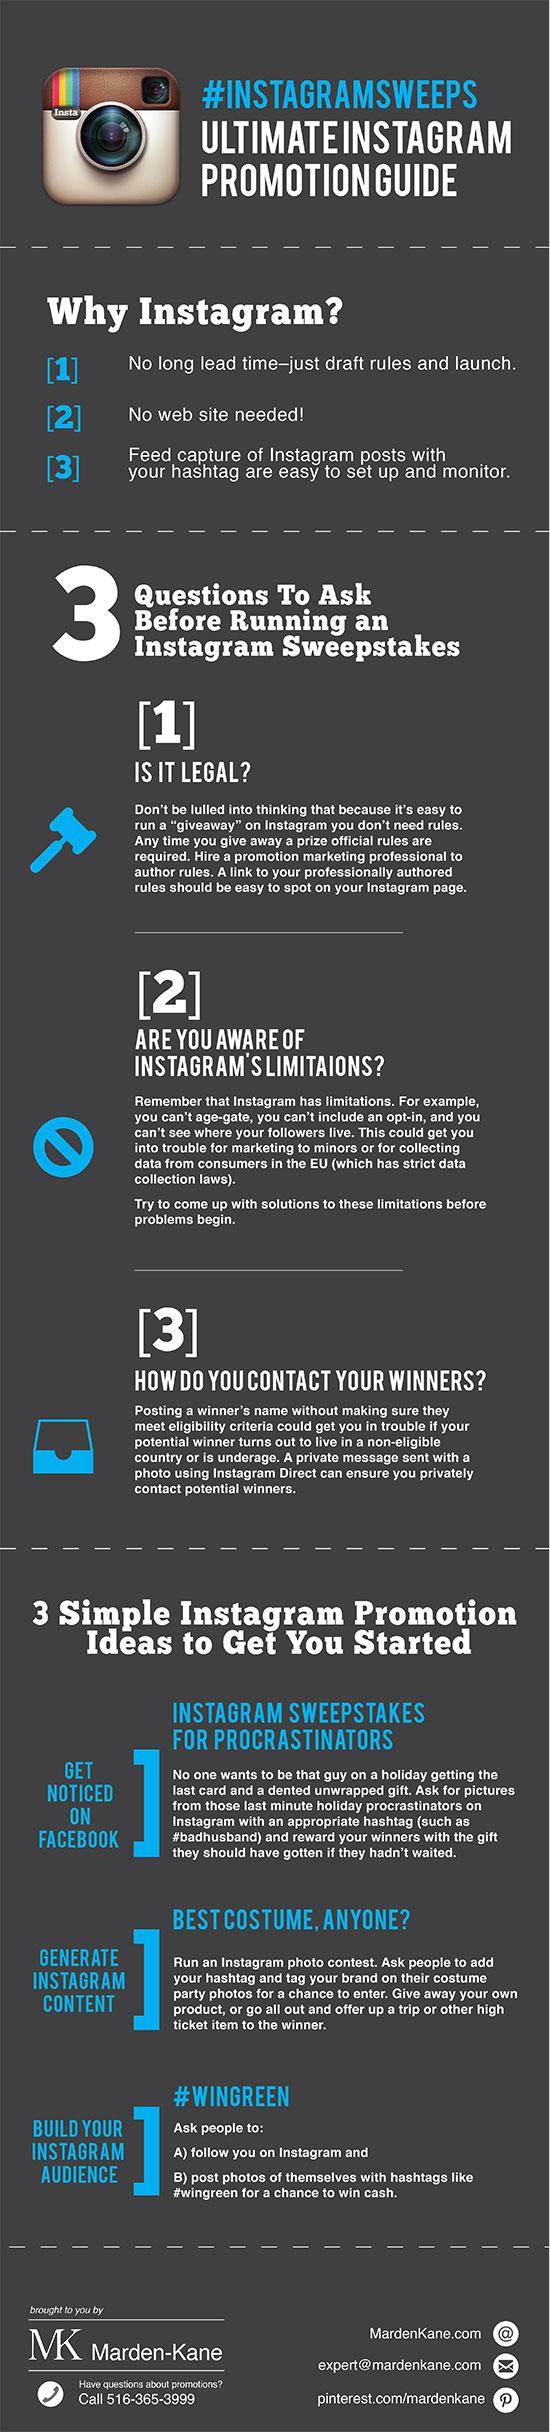 Ultimate Instagram Promotion Guide - Marden-Kane